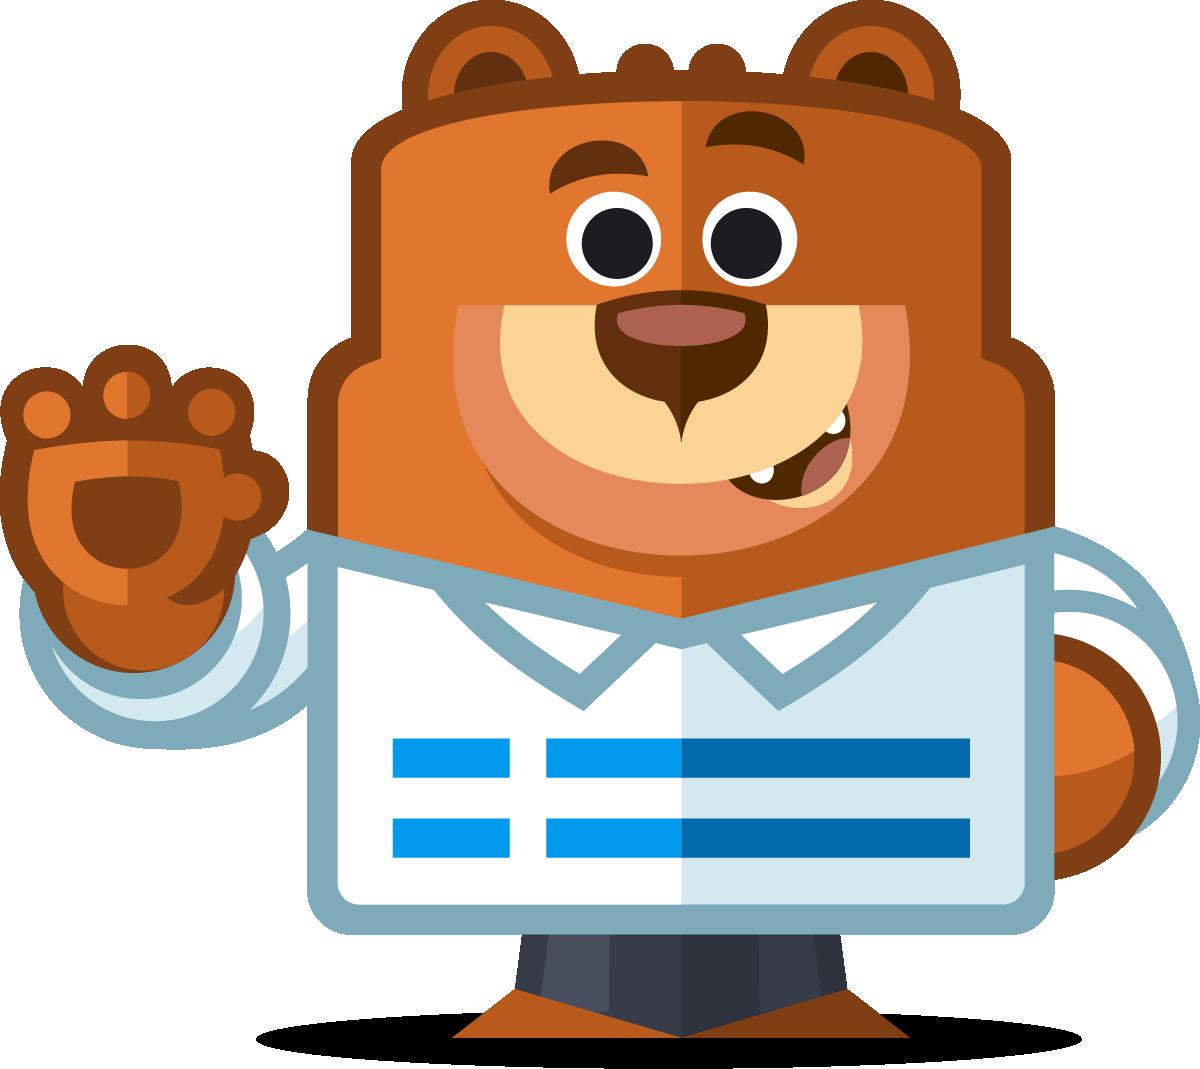 WPForms Press Resources - Brand Assets, Logos, and Screenshots